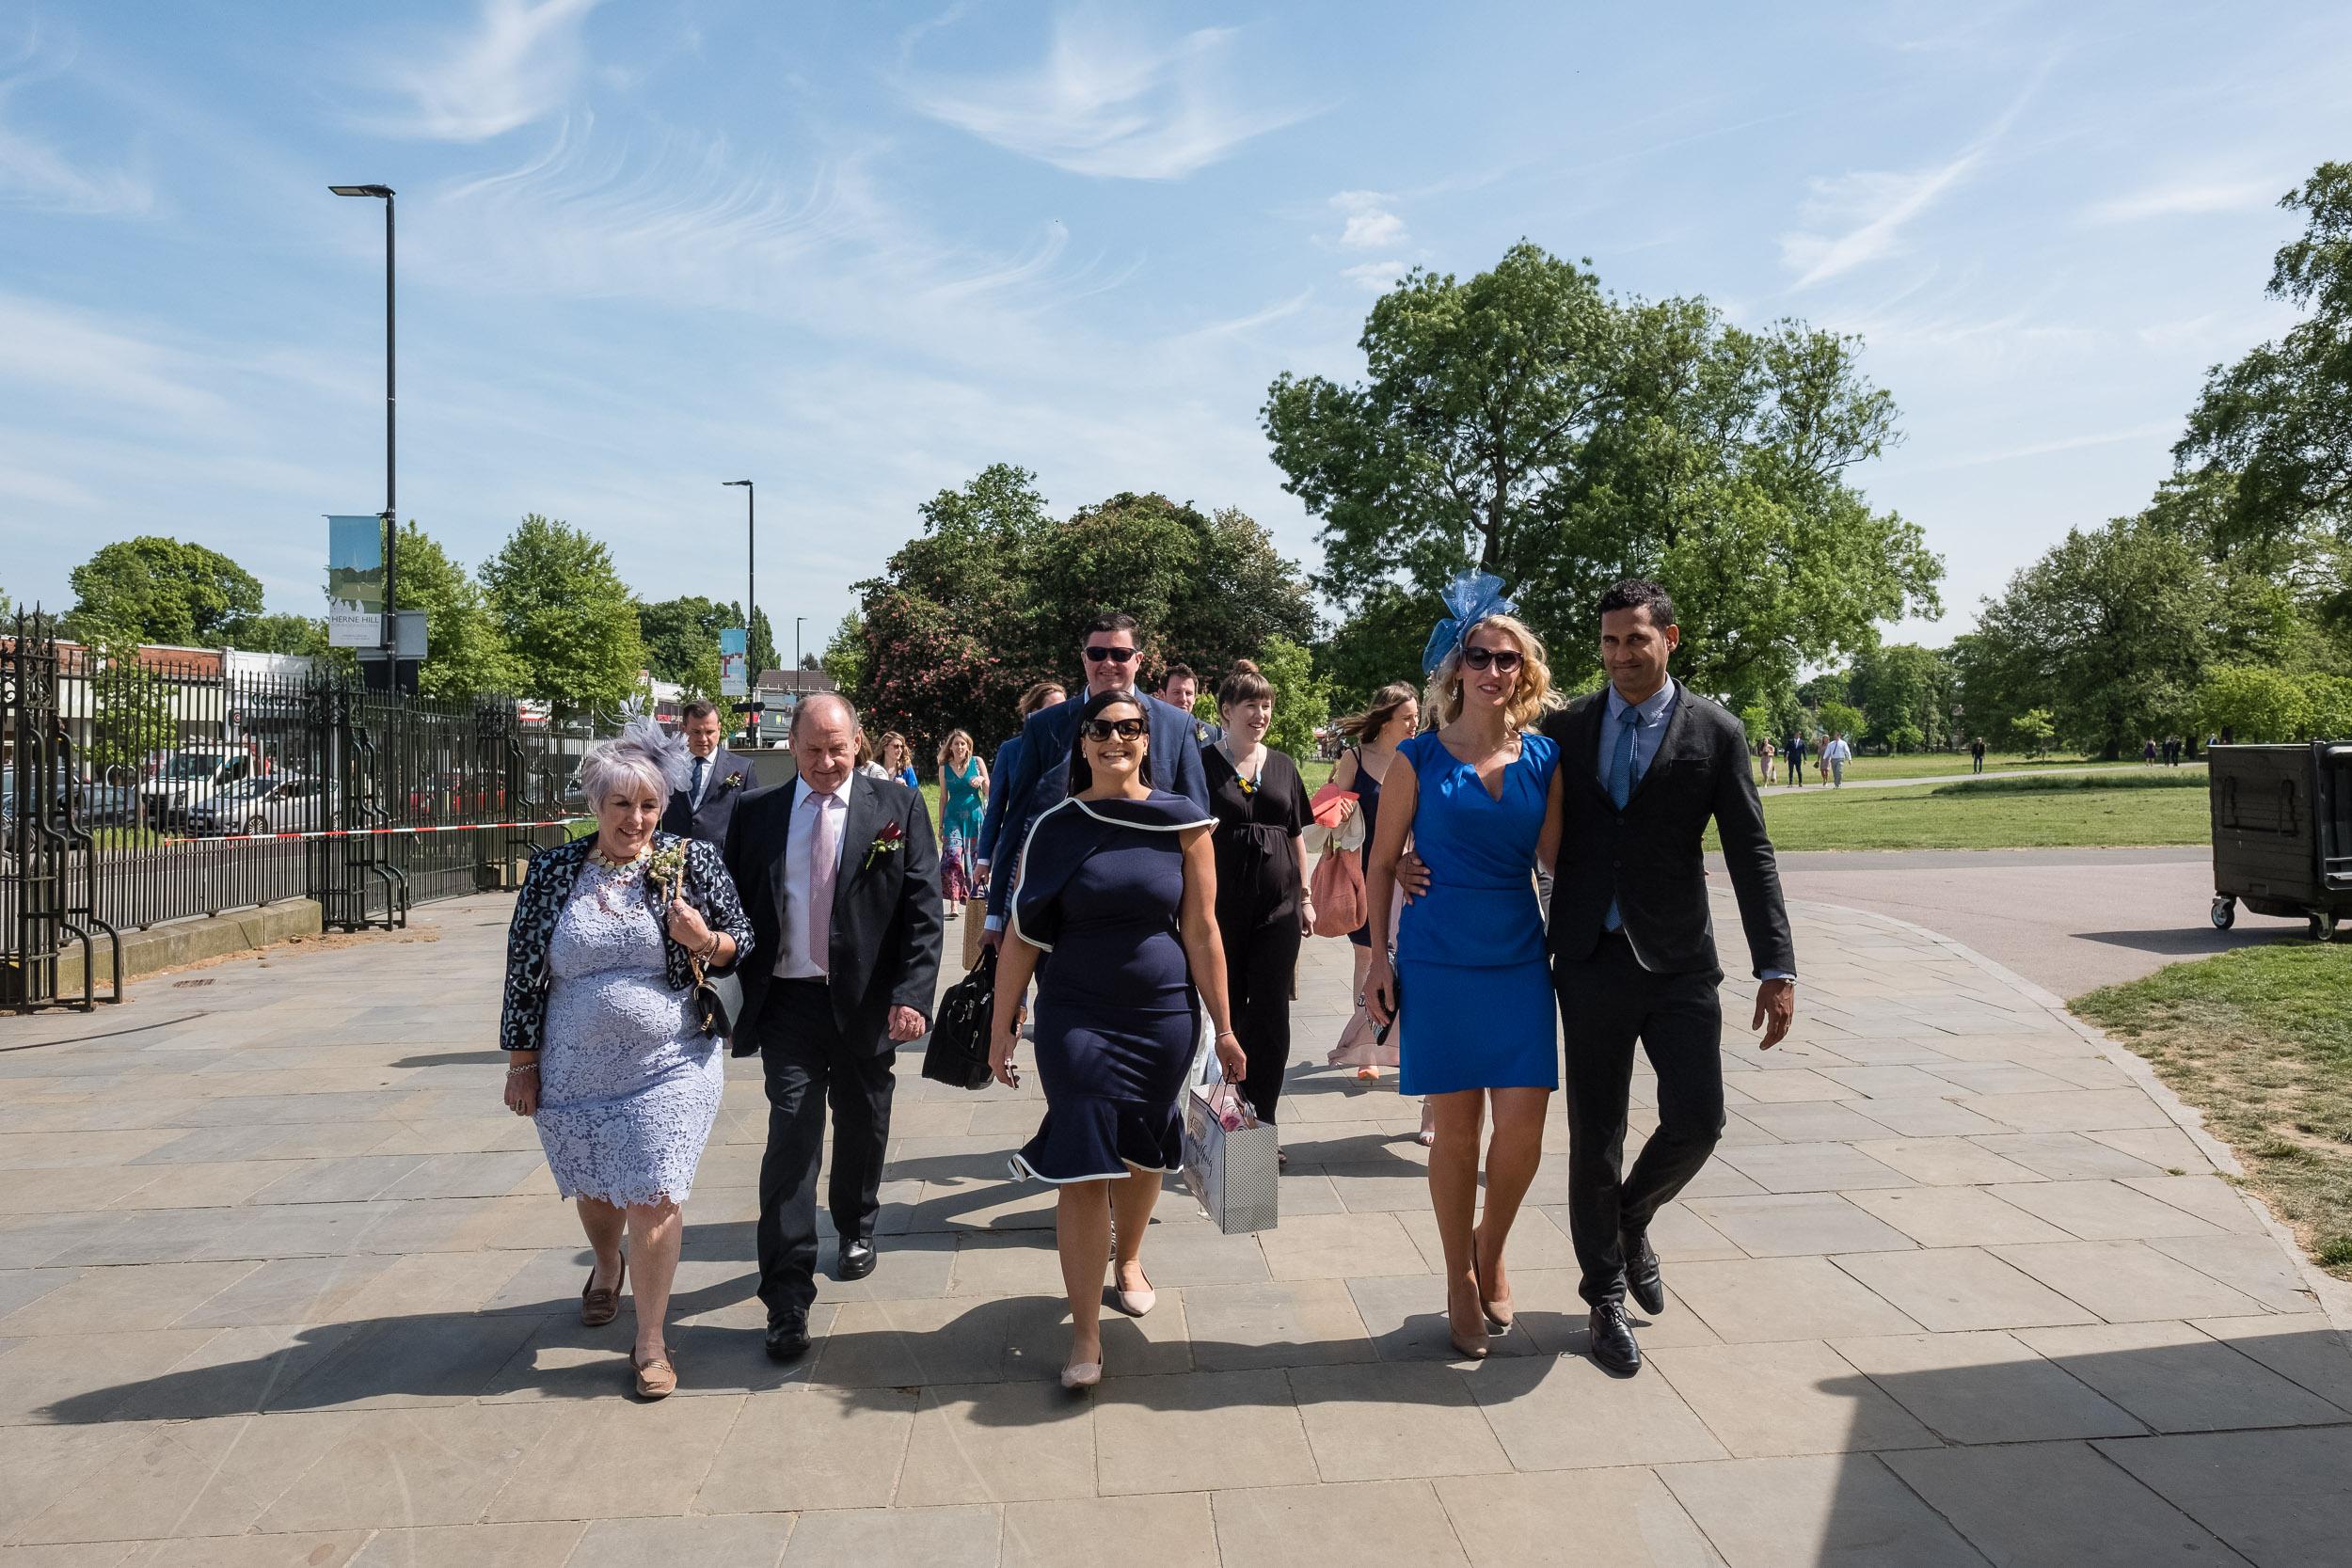 brockwell-lido-brixton-herne-hill-wedding-103.jpg